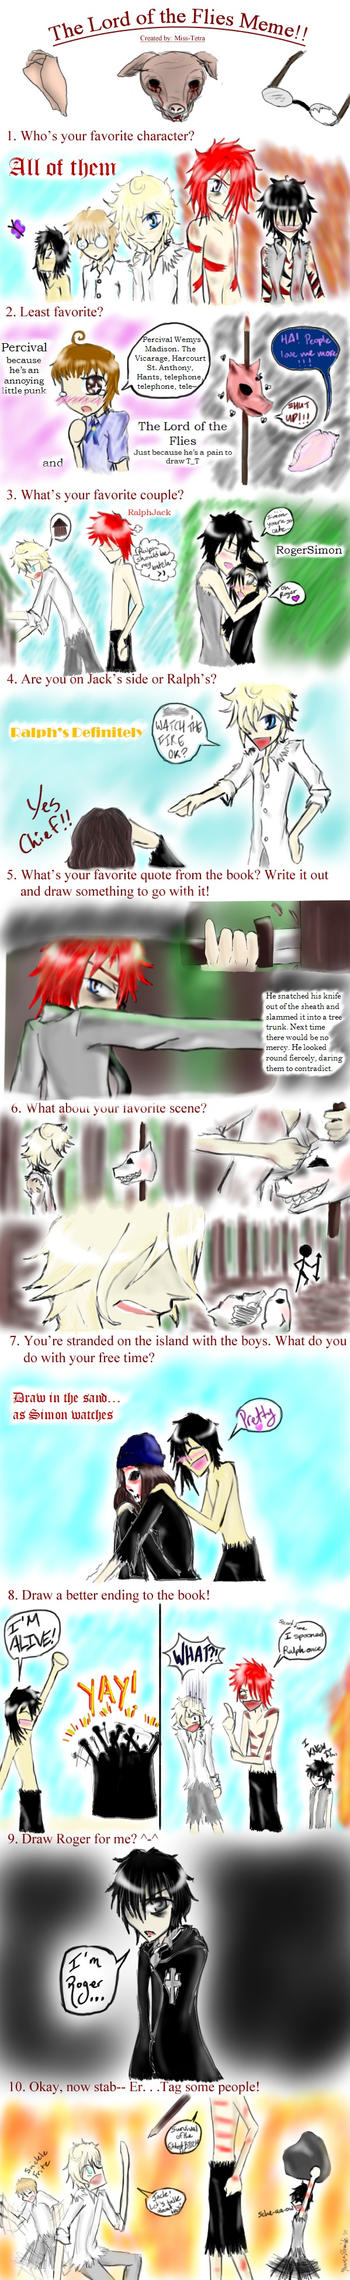 Lord of the Flies Meme by vamp666akuma